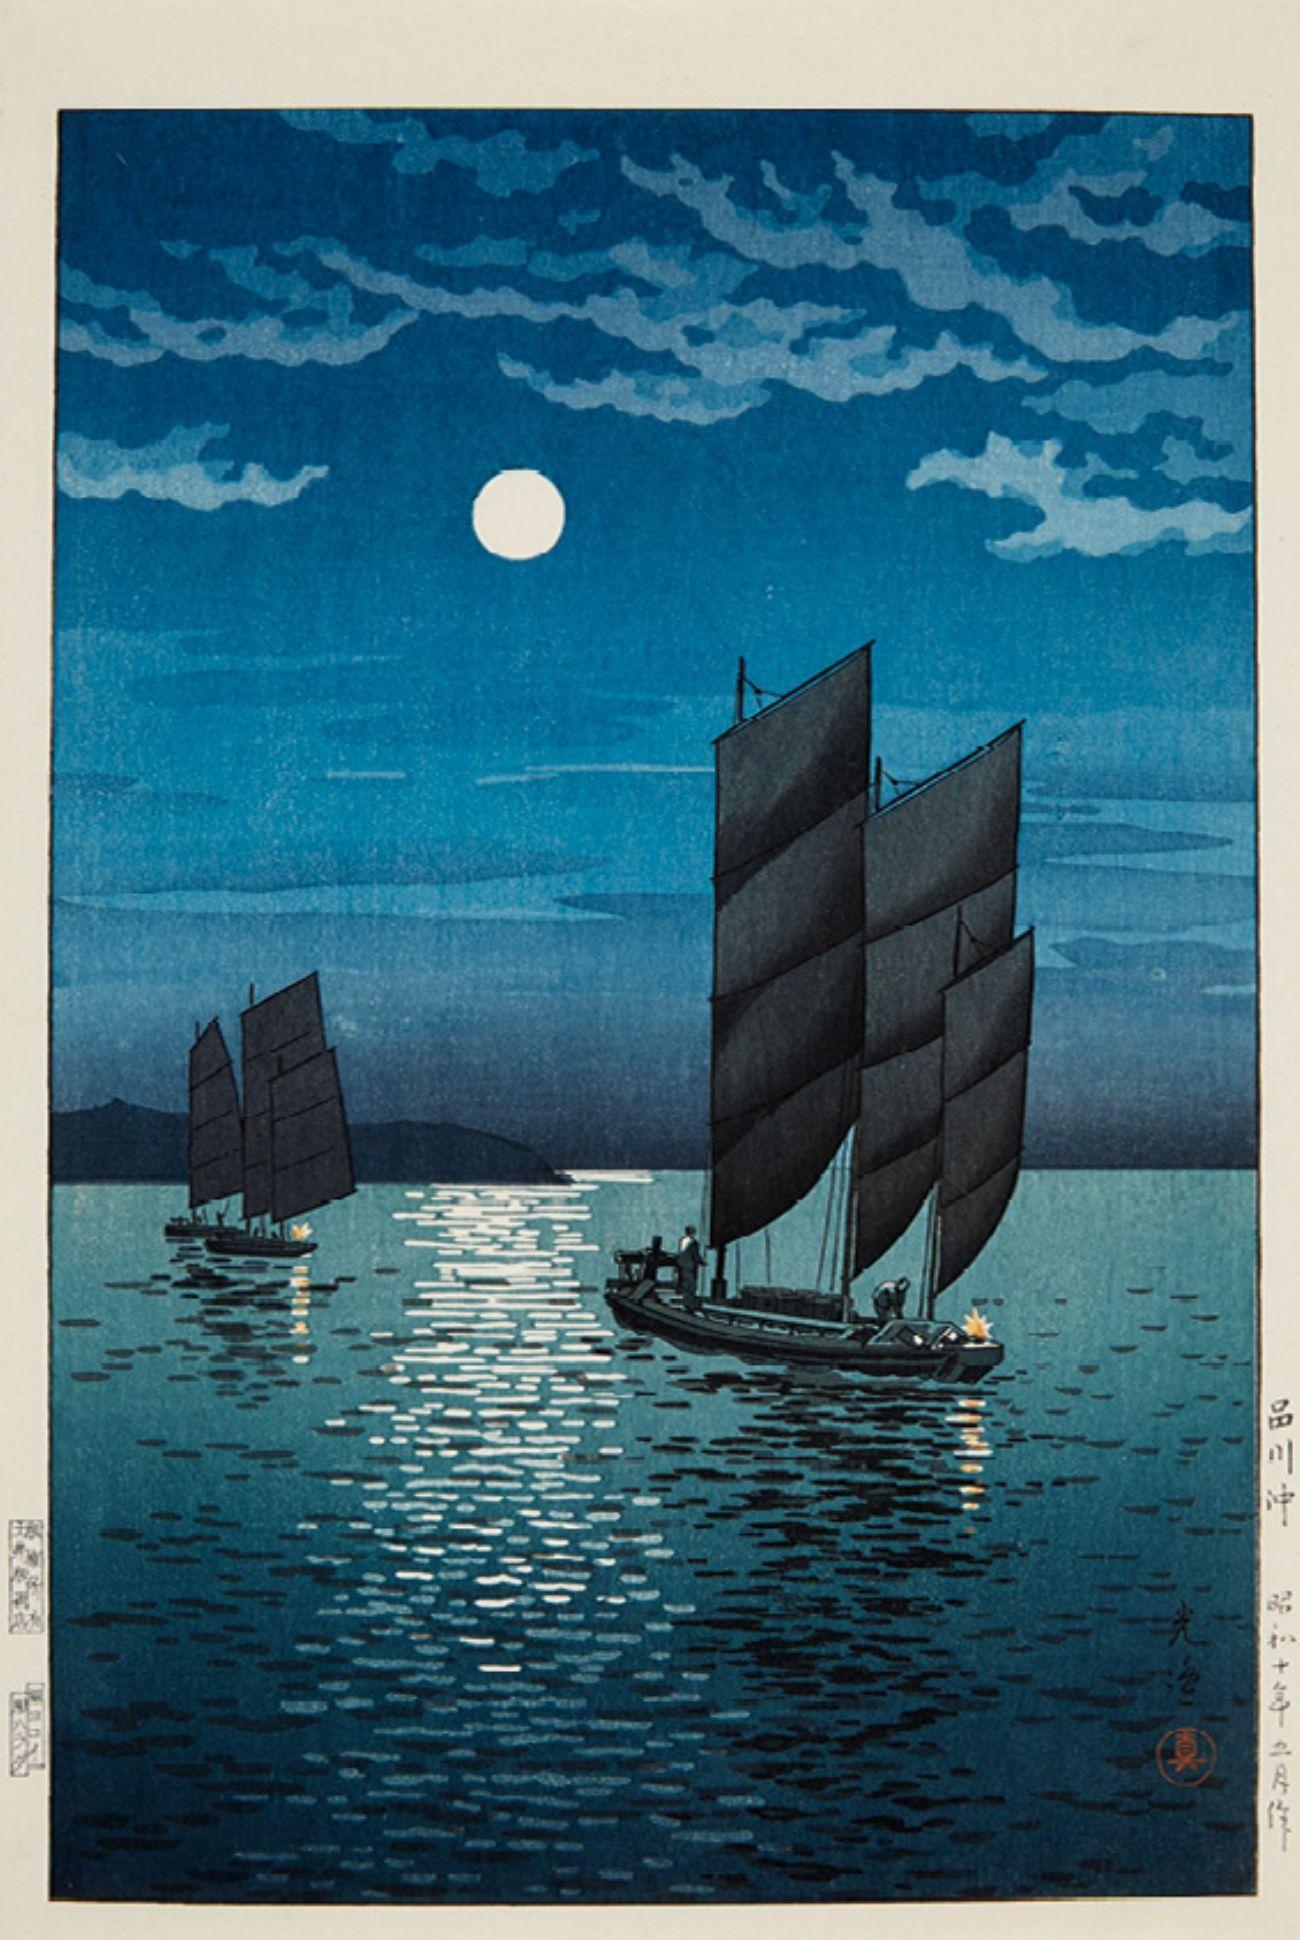 Tsuchiya Kôitsu (1870-1949)  Ôban. Title: Shinagawa oki. Ships sailing by the light of the full moon. Signed: Kôitsu. Seal: Shin. Publisher: Doi hanga ten. Watermark: do. Block carver: Harada. Printer: Yokoi. Date: Shôwa 10 (1935). Printed after 1950. Very good impression, colours and condition.